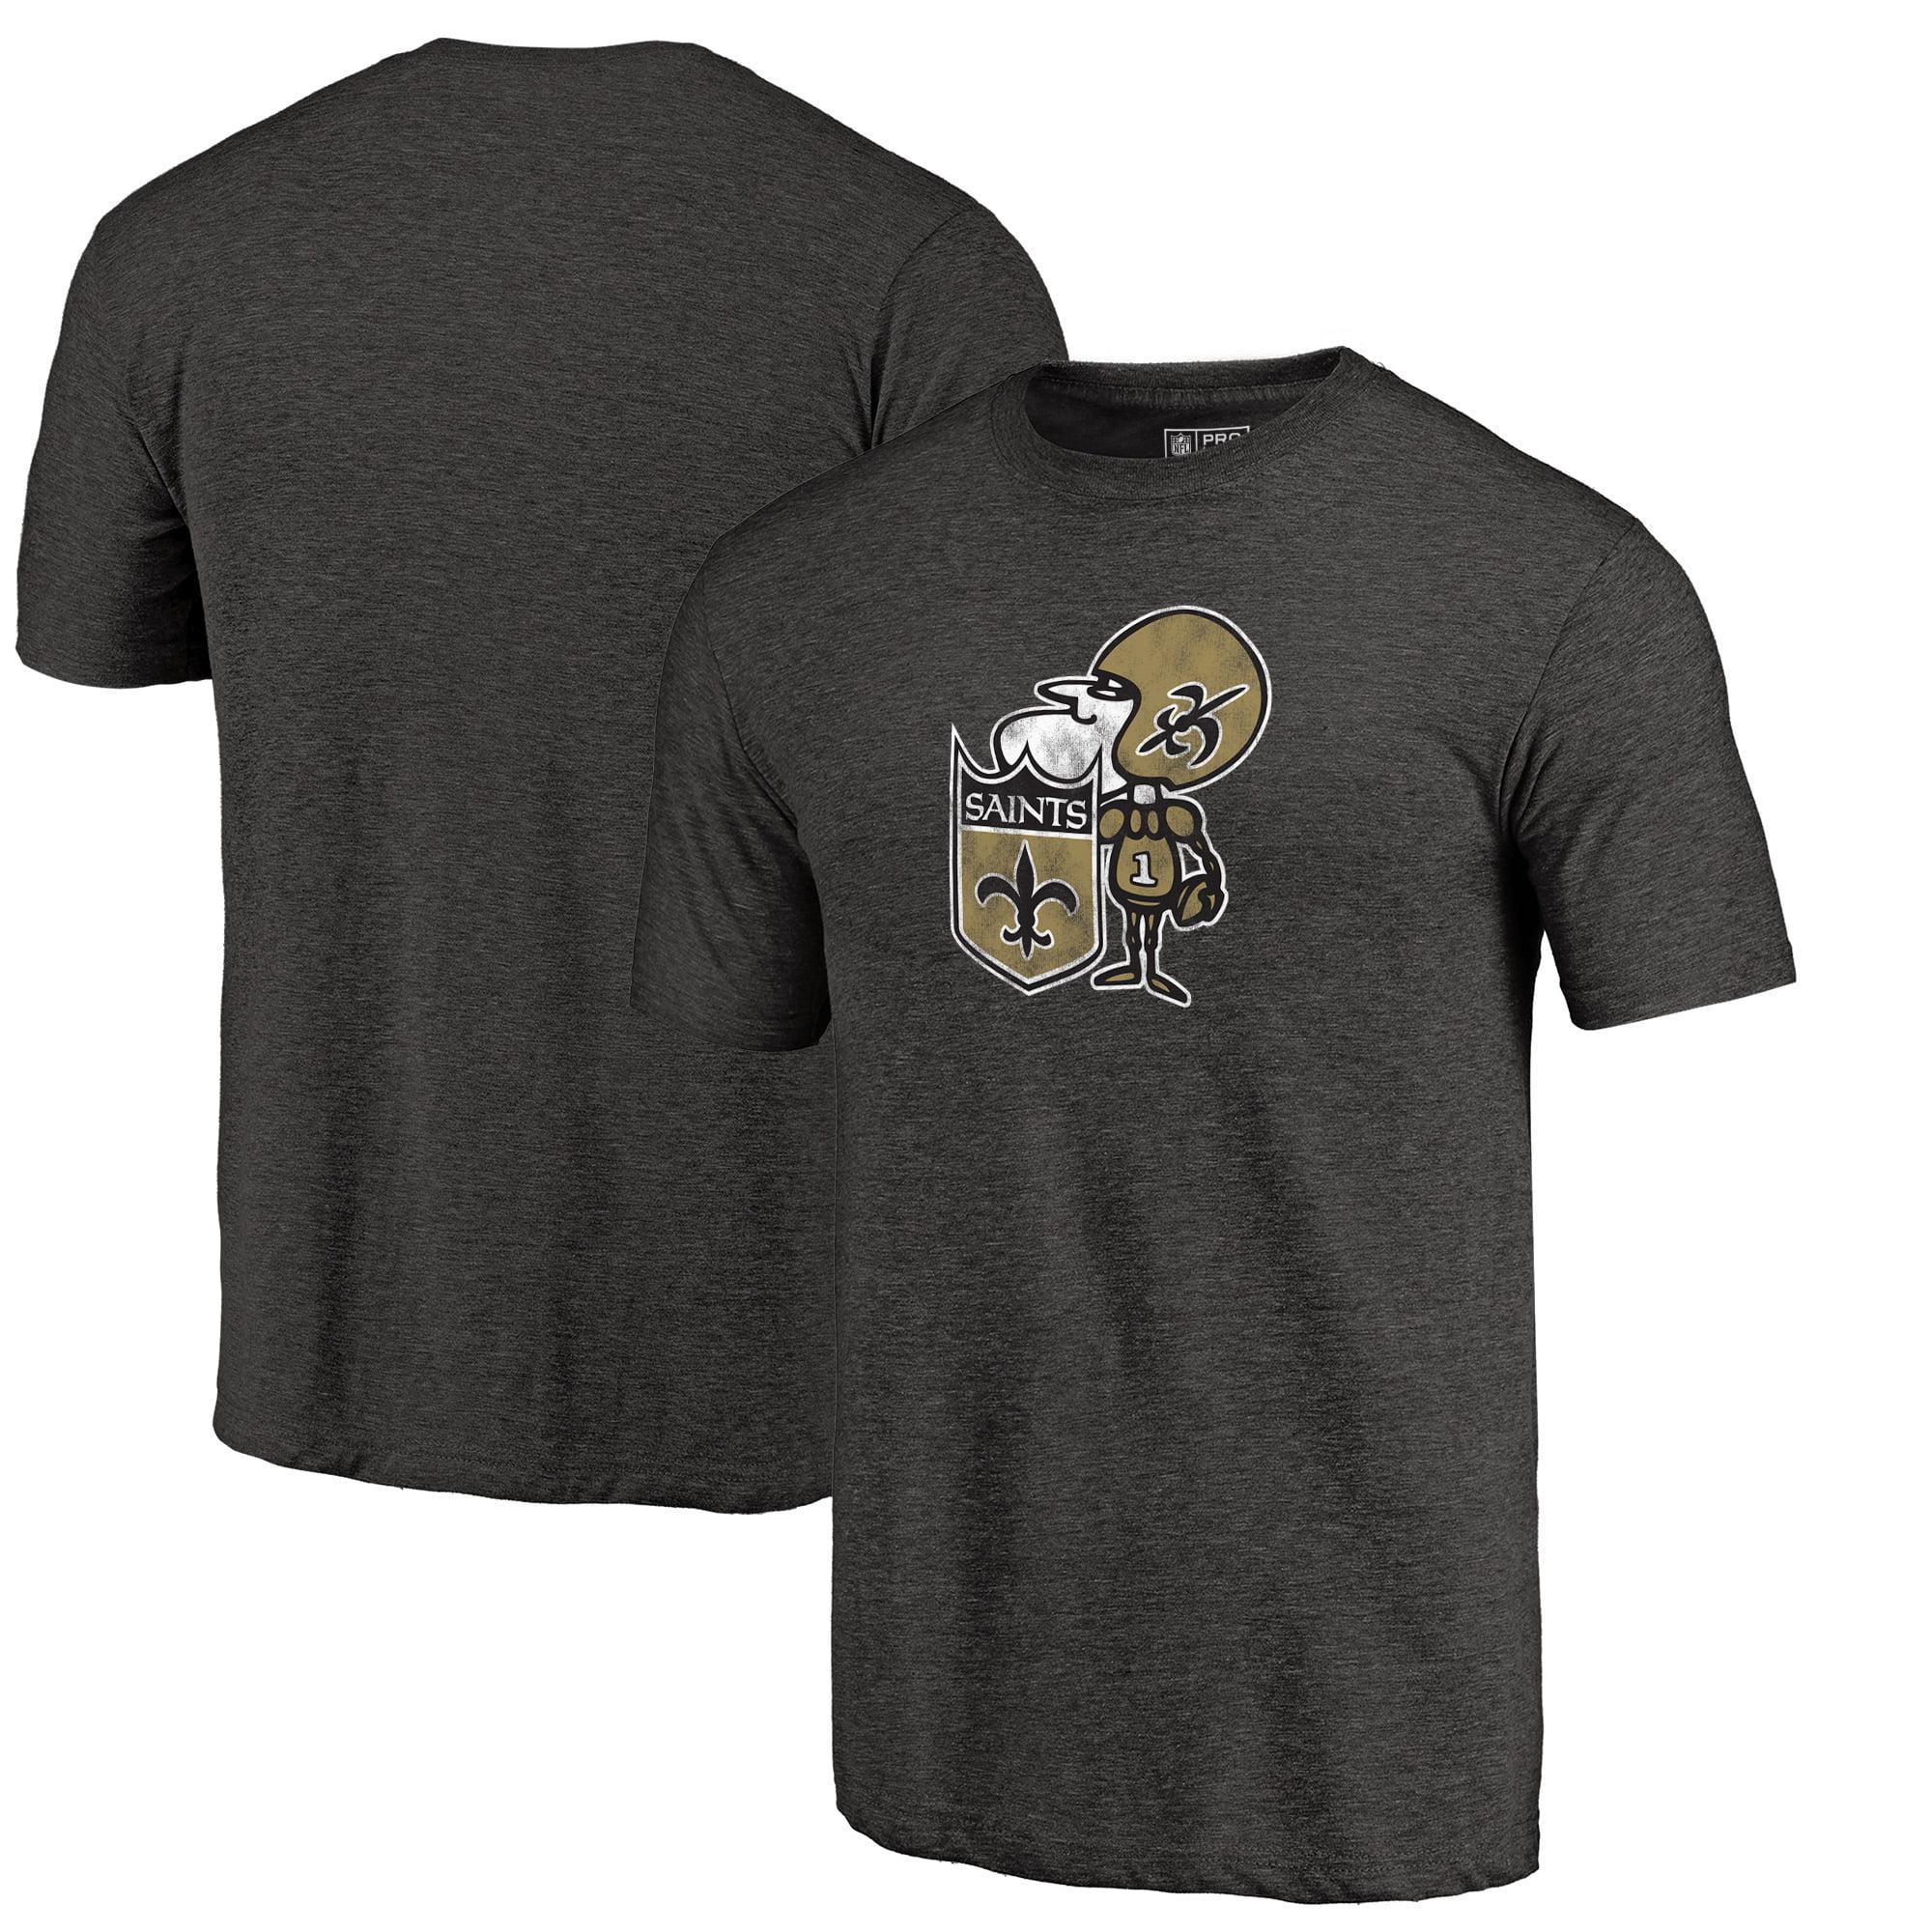 New Orleans Saints NFL Pro Line by Fanatics Branded Throwback Logo Tri-Blend T-Shirt - Black